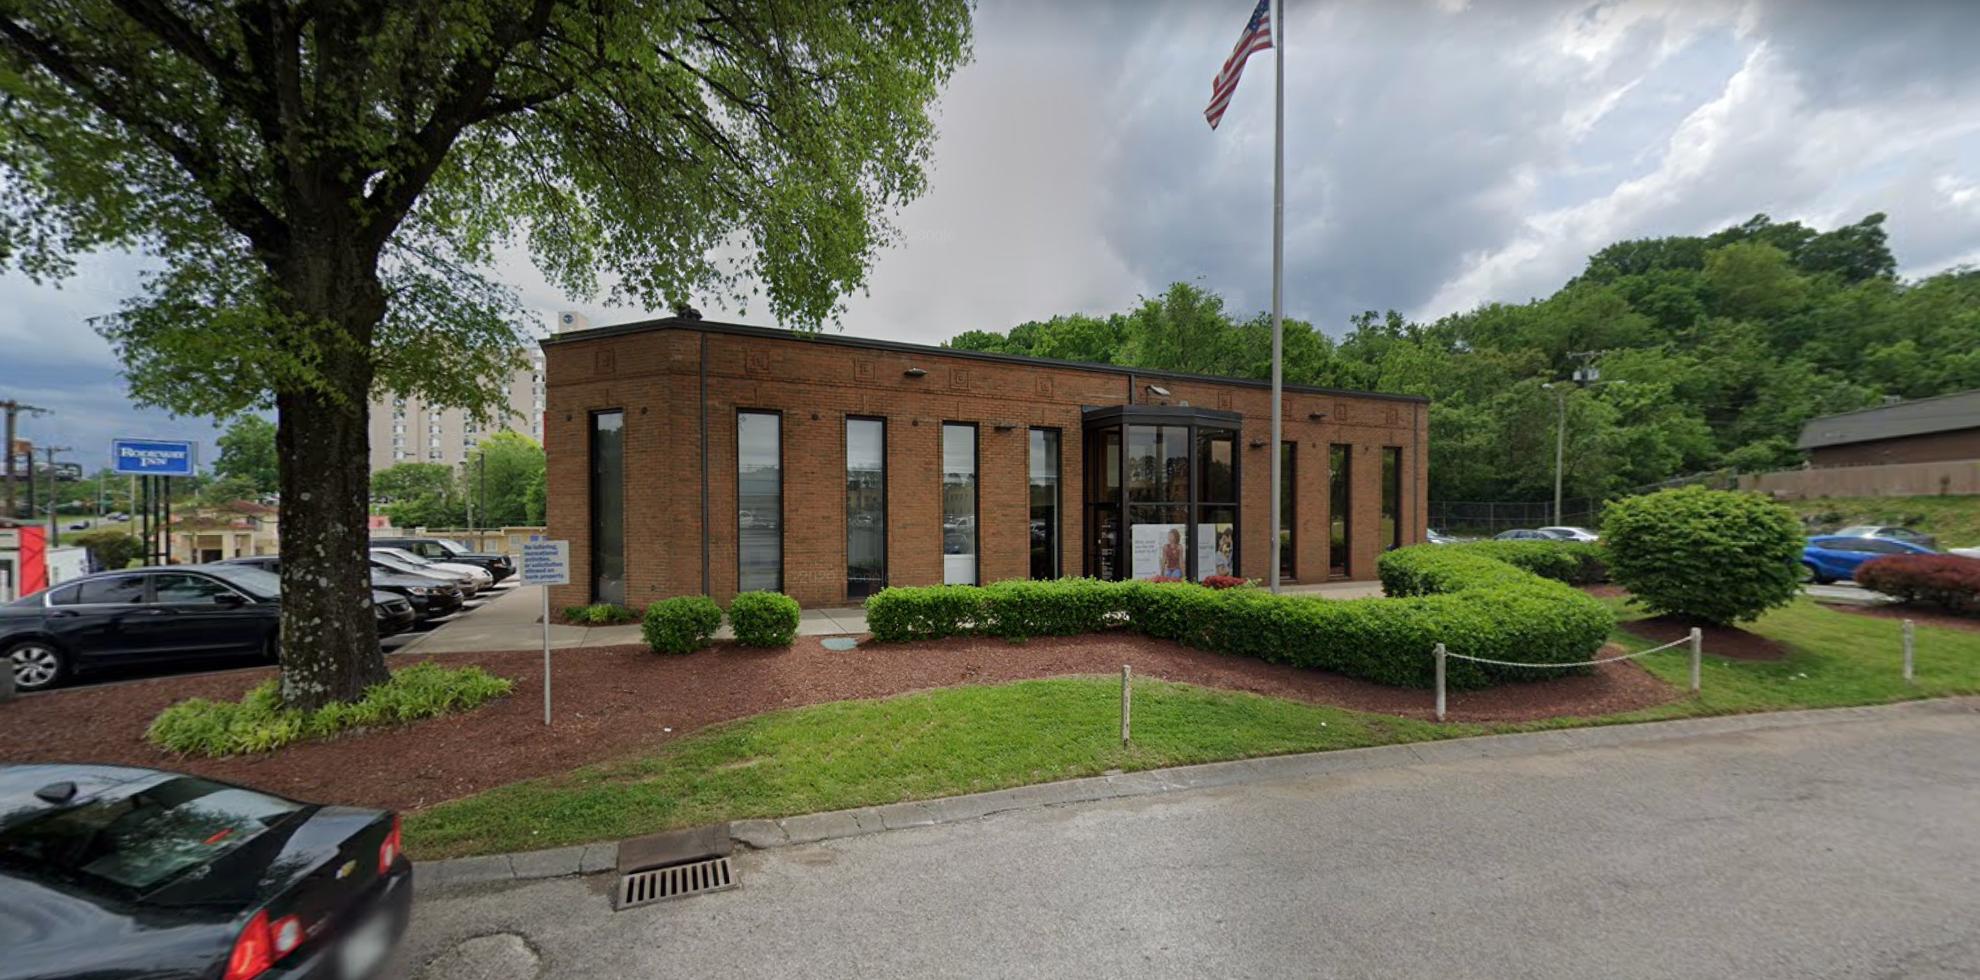 Bank of America financial center with drive-thru ATM   837 Murfreesboro Pike, Nashville, TN 37217